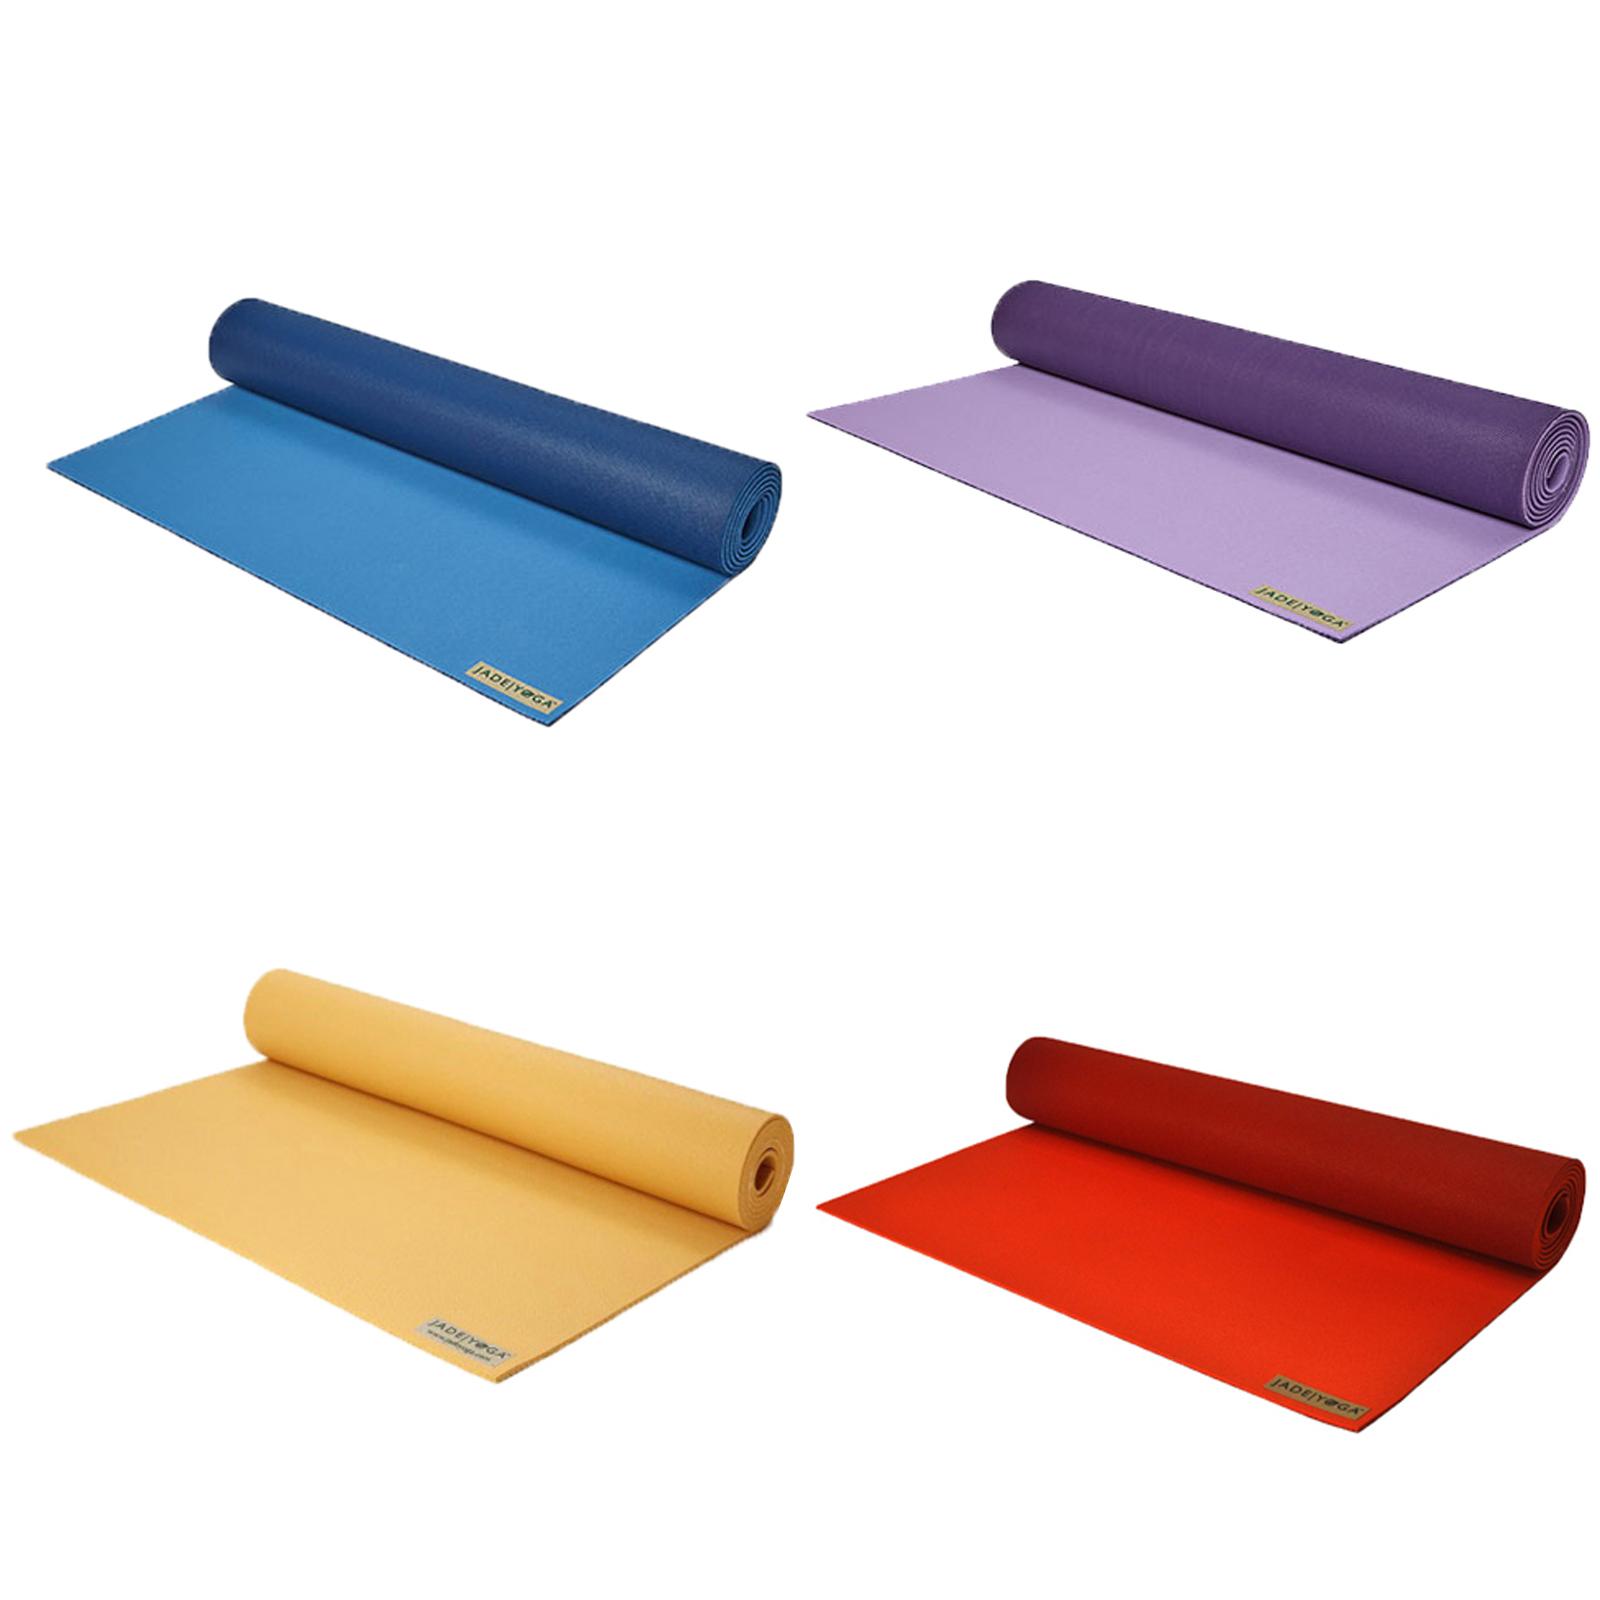 Jade Yoga Harmony 71 Inch Eco Friendly Yoga Pilates Exercise Fitness Mat 5mm Ebay